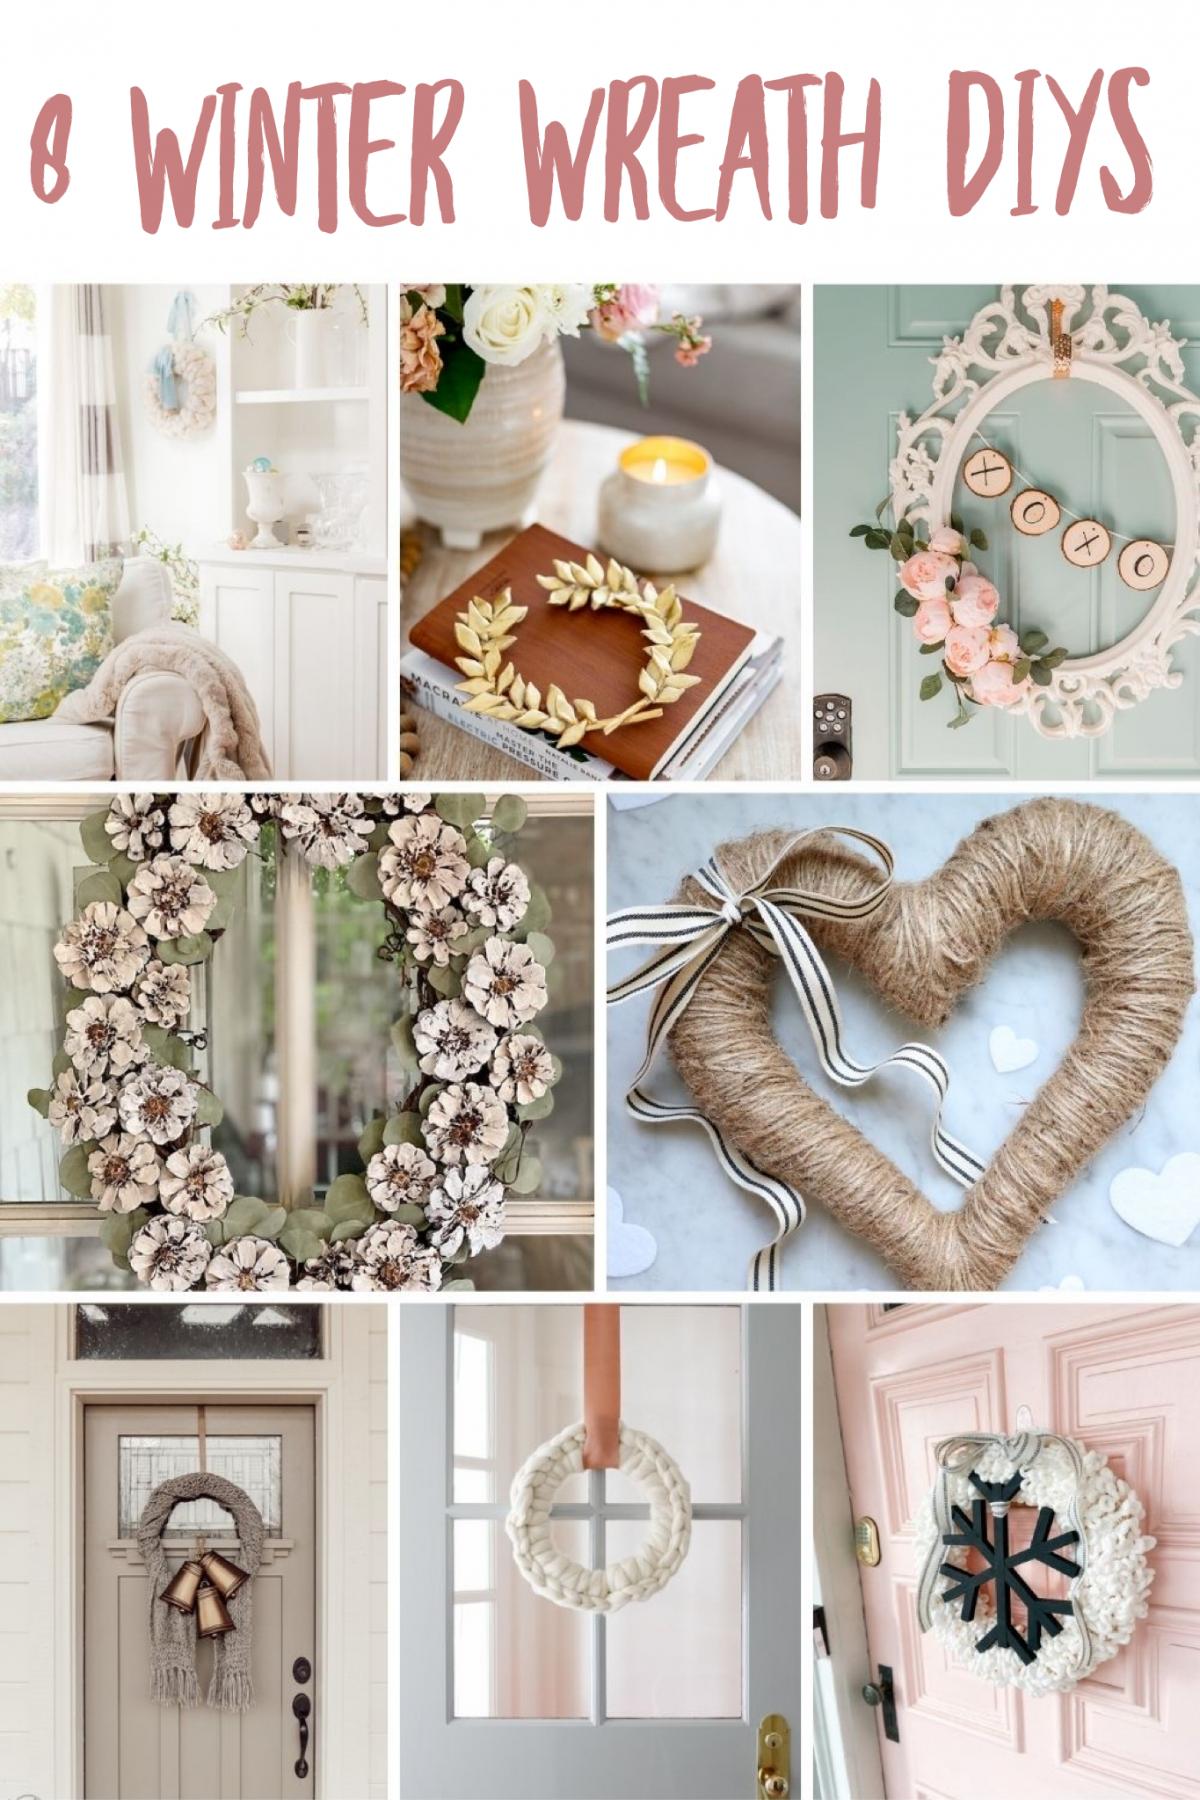 8 Winter Wreath Ideas